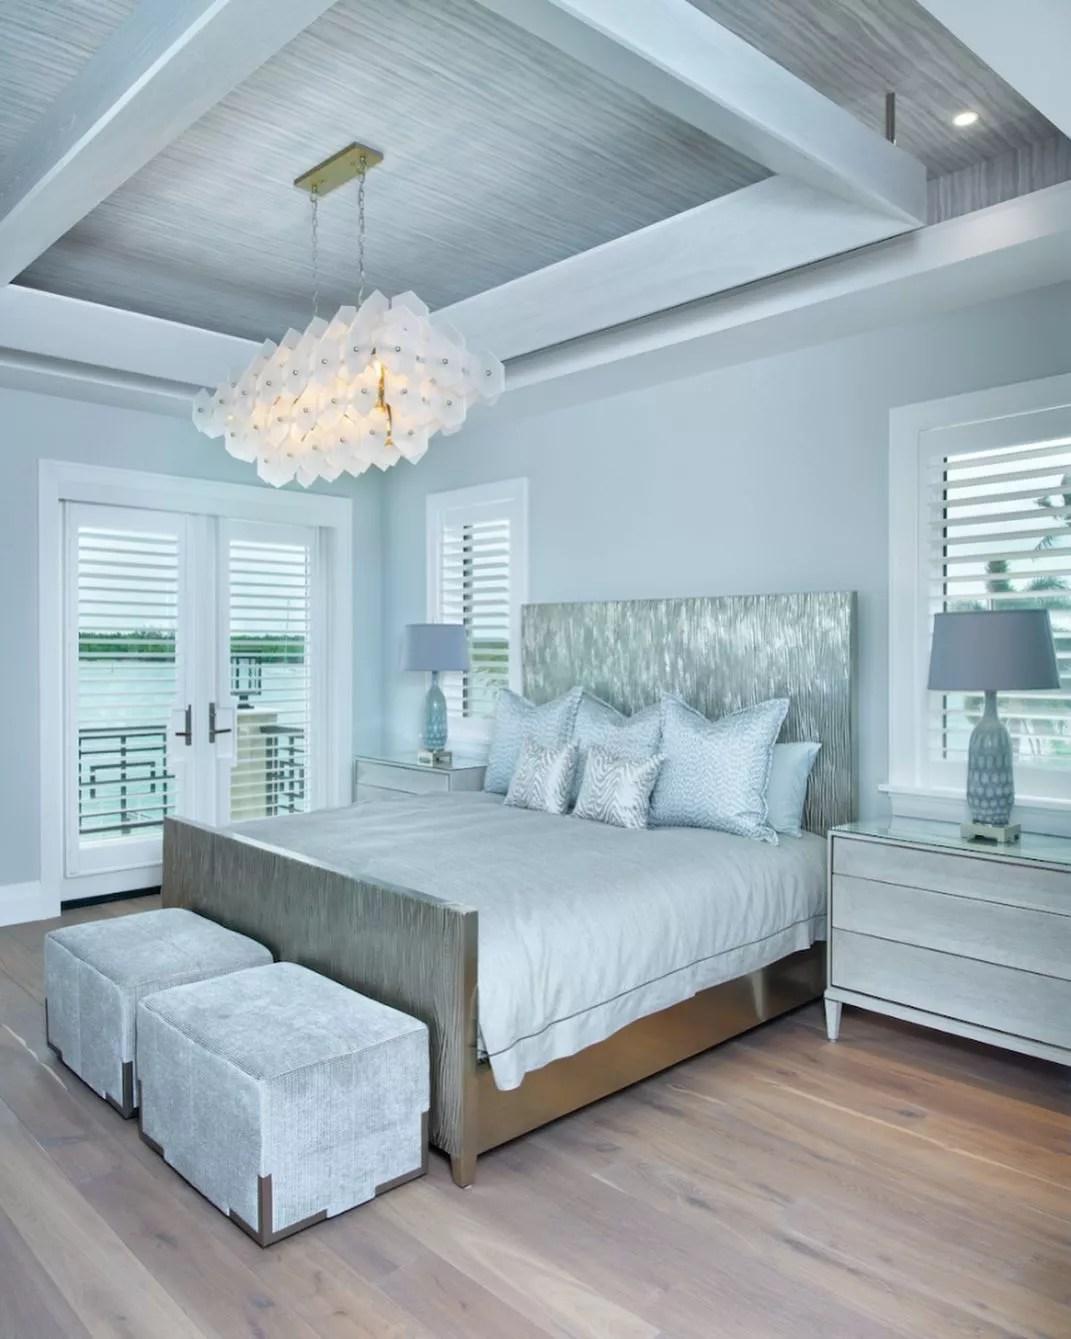 Photo of large, open bedroom with light hardwood floors and sky blue walls. Photo by Instagram user @ illuminateddesign_naples.